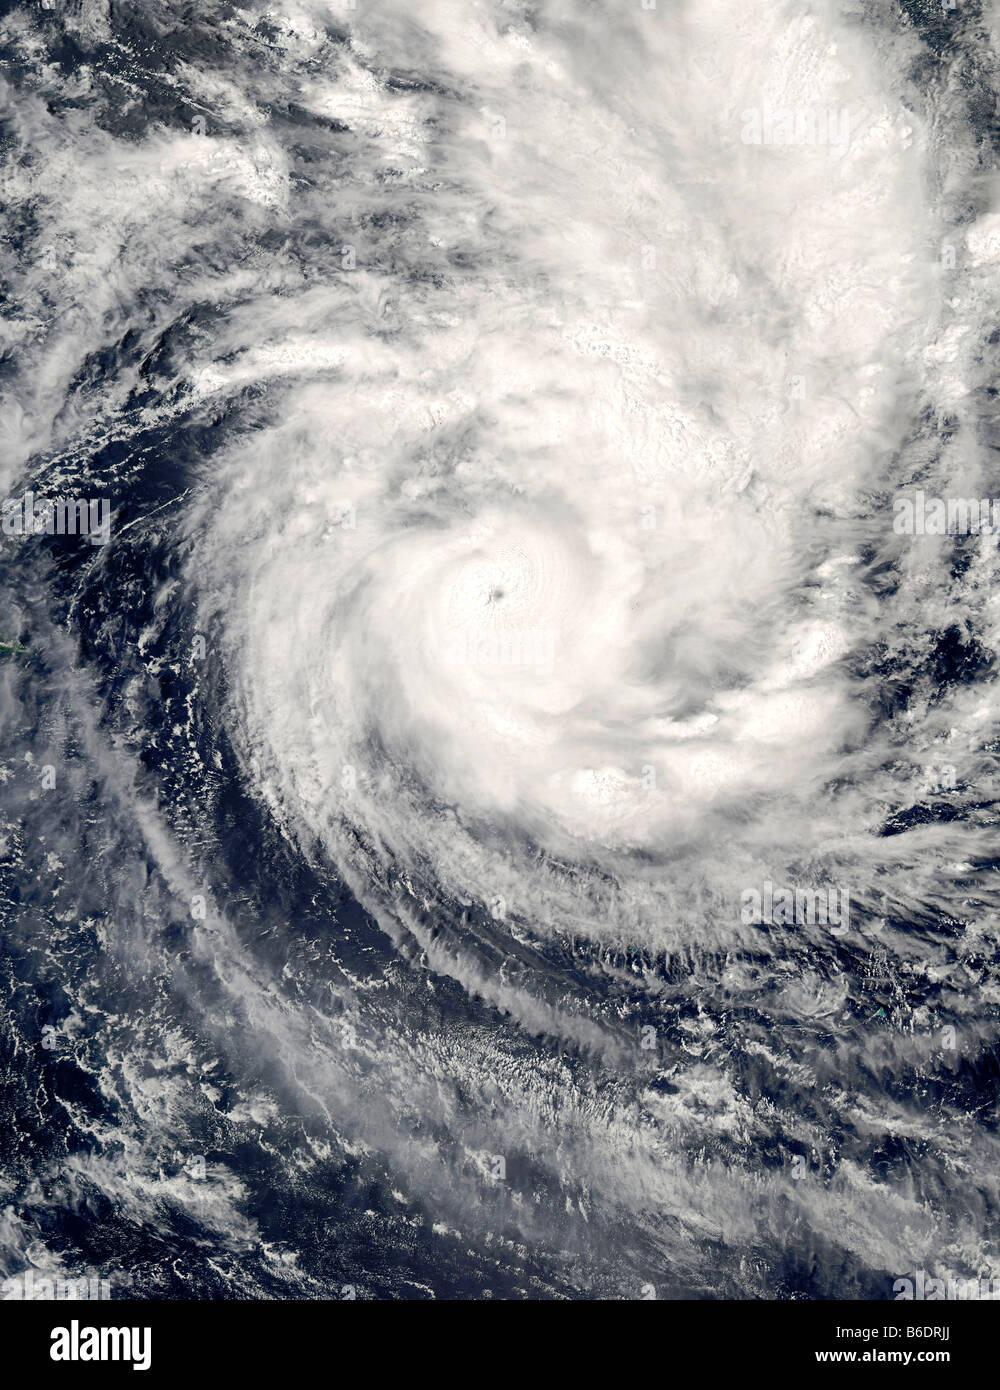 Tropical cyclone Percy. Aqua satellite image of tropical cyclone Percy in the South Pacific Ocean. - Stock Image